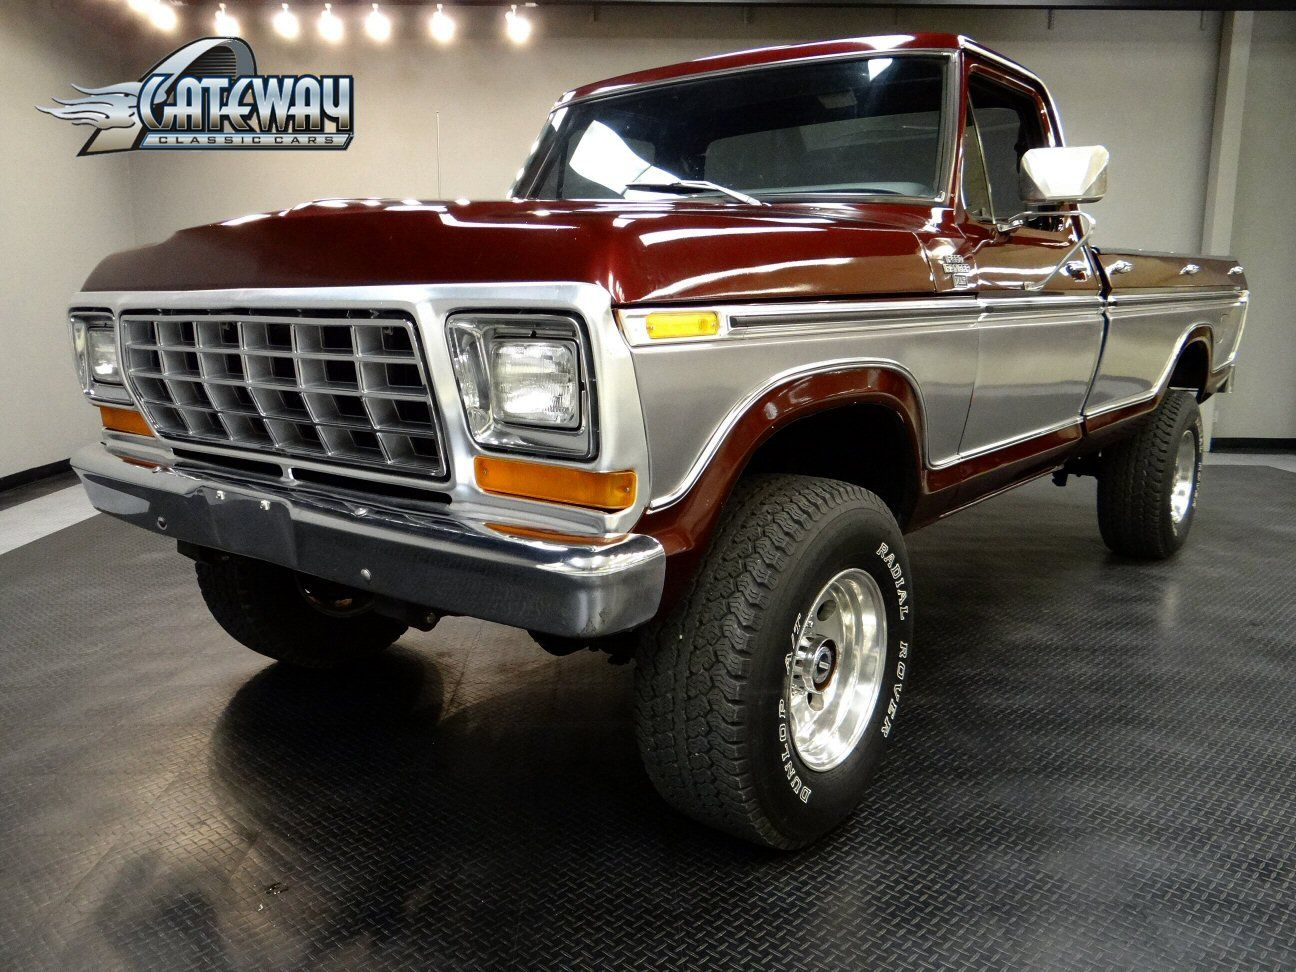 1978 Ford Truck >> 1978 Ford F 250 4x4 Pickup Cool Wheels 79 Ford Truck Classic